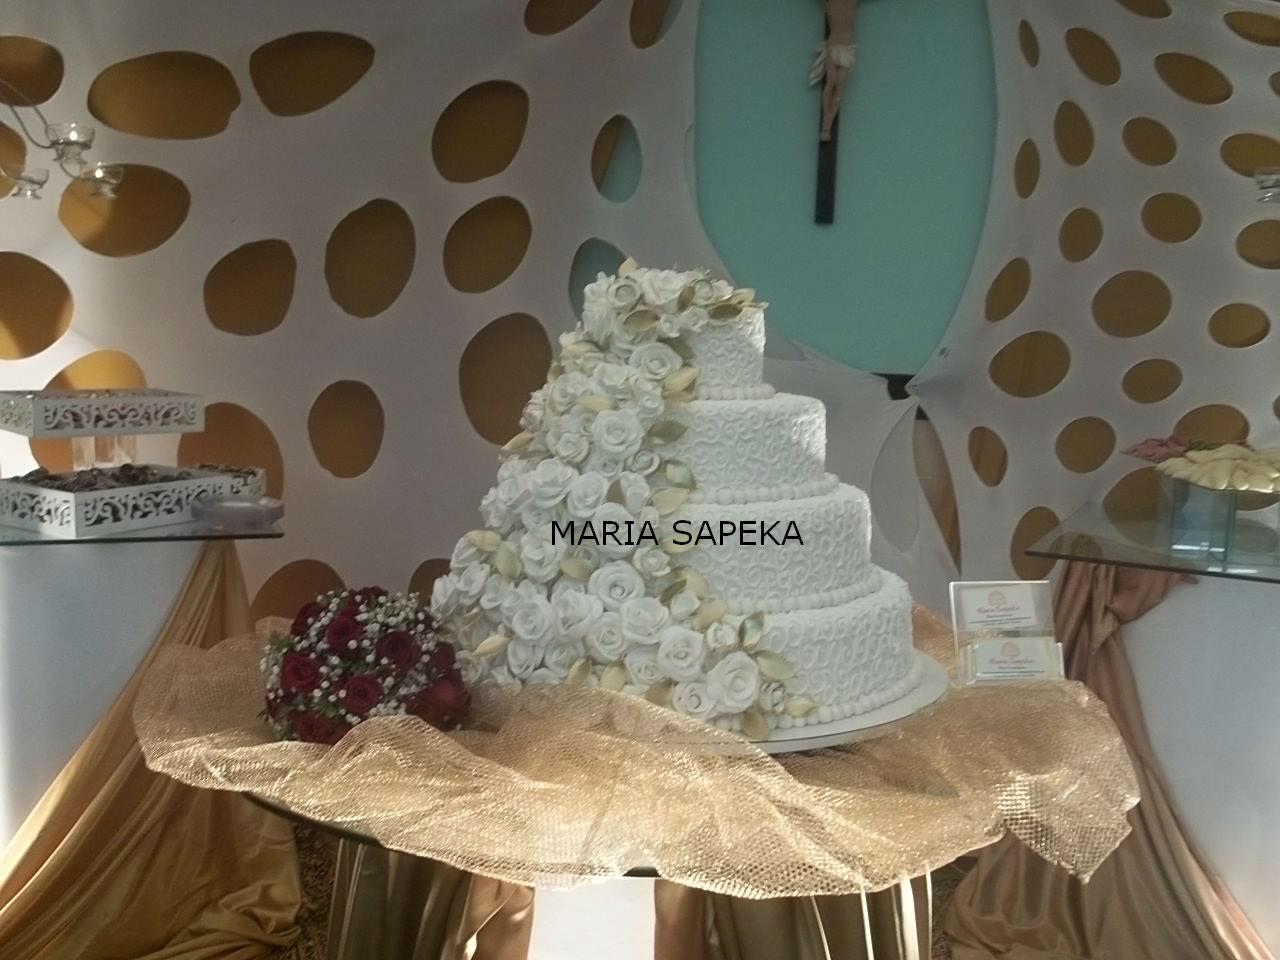 http://4.bp.blogspot.com/-kbCVp-QGLkY/Tp3bLDFyx2I/AAAAAAAAA4I/ycJGJJitjGM/s1600/casamento+de+larissa+033.jpg